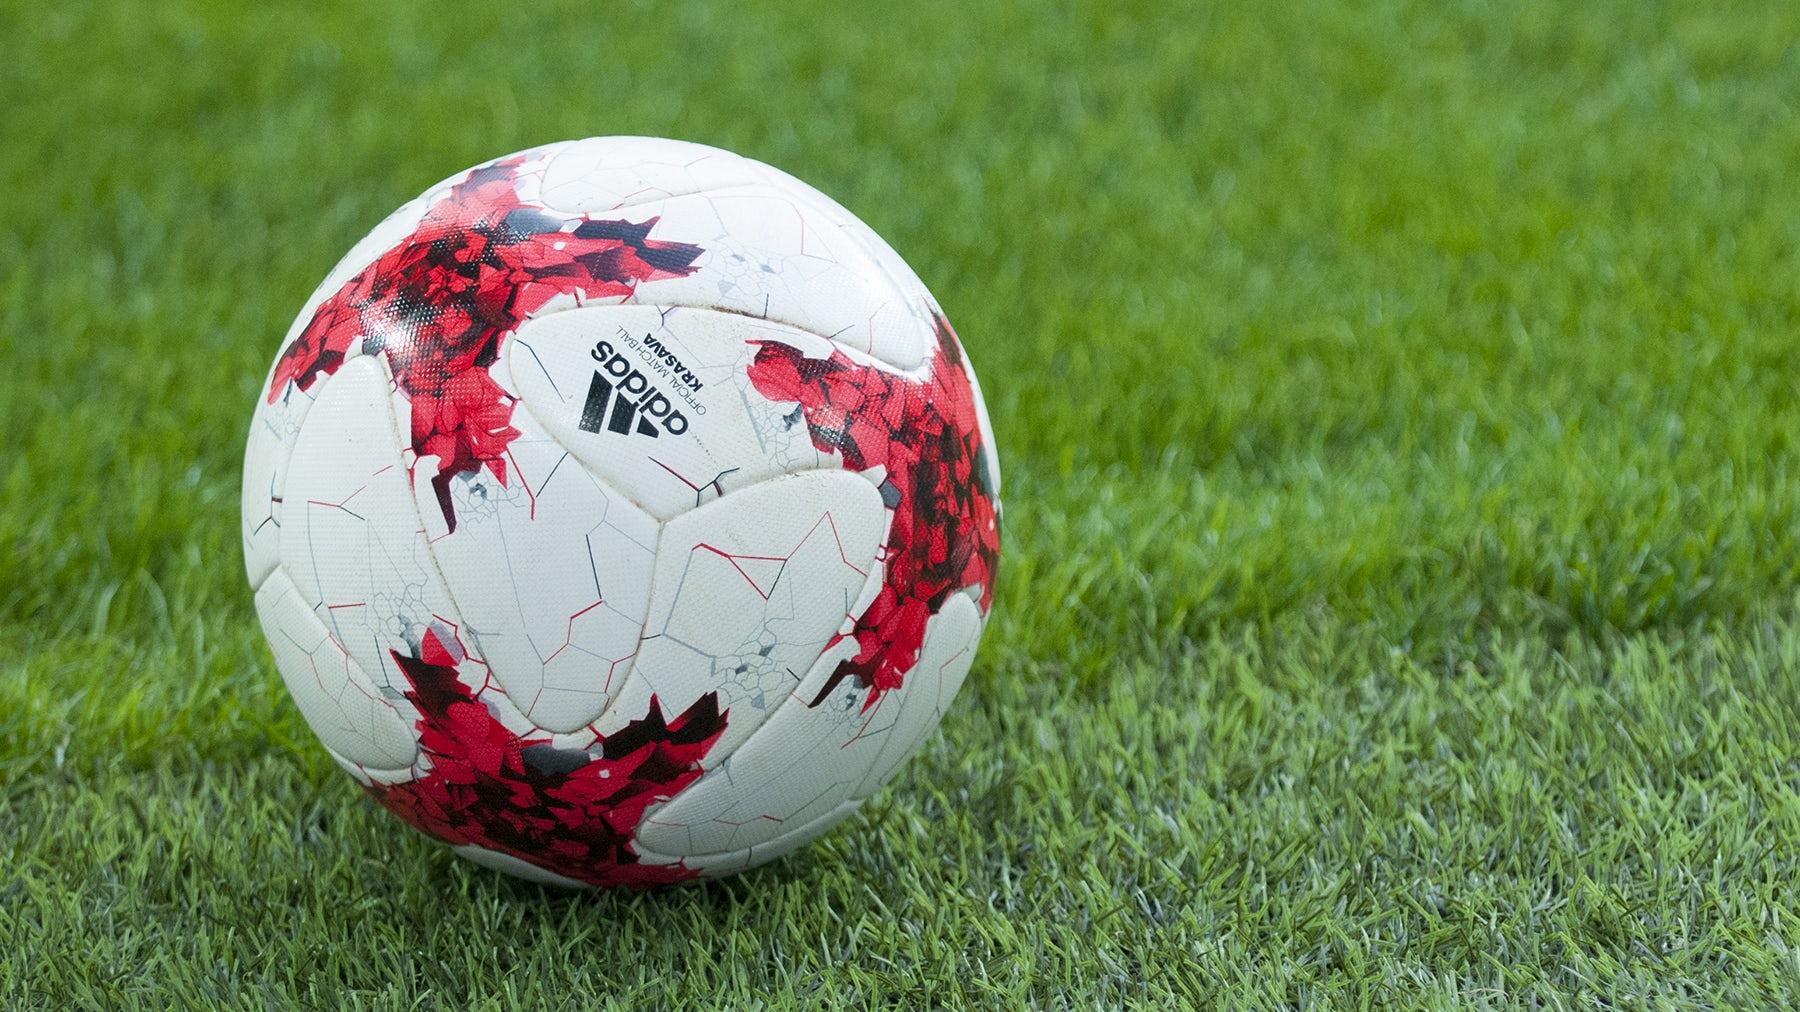 Adidas Edges Nike in World Cup Team Sponsorship